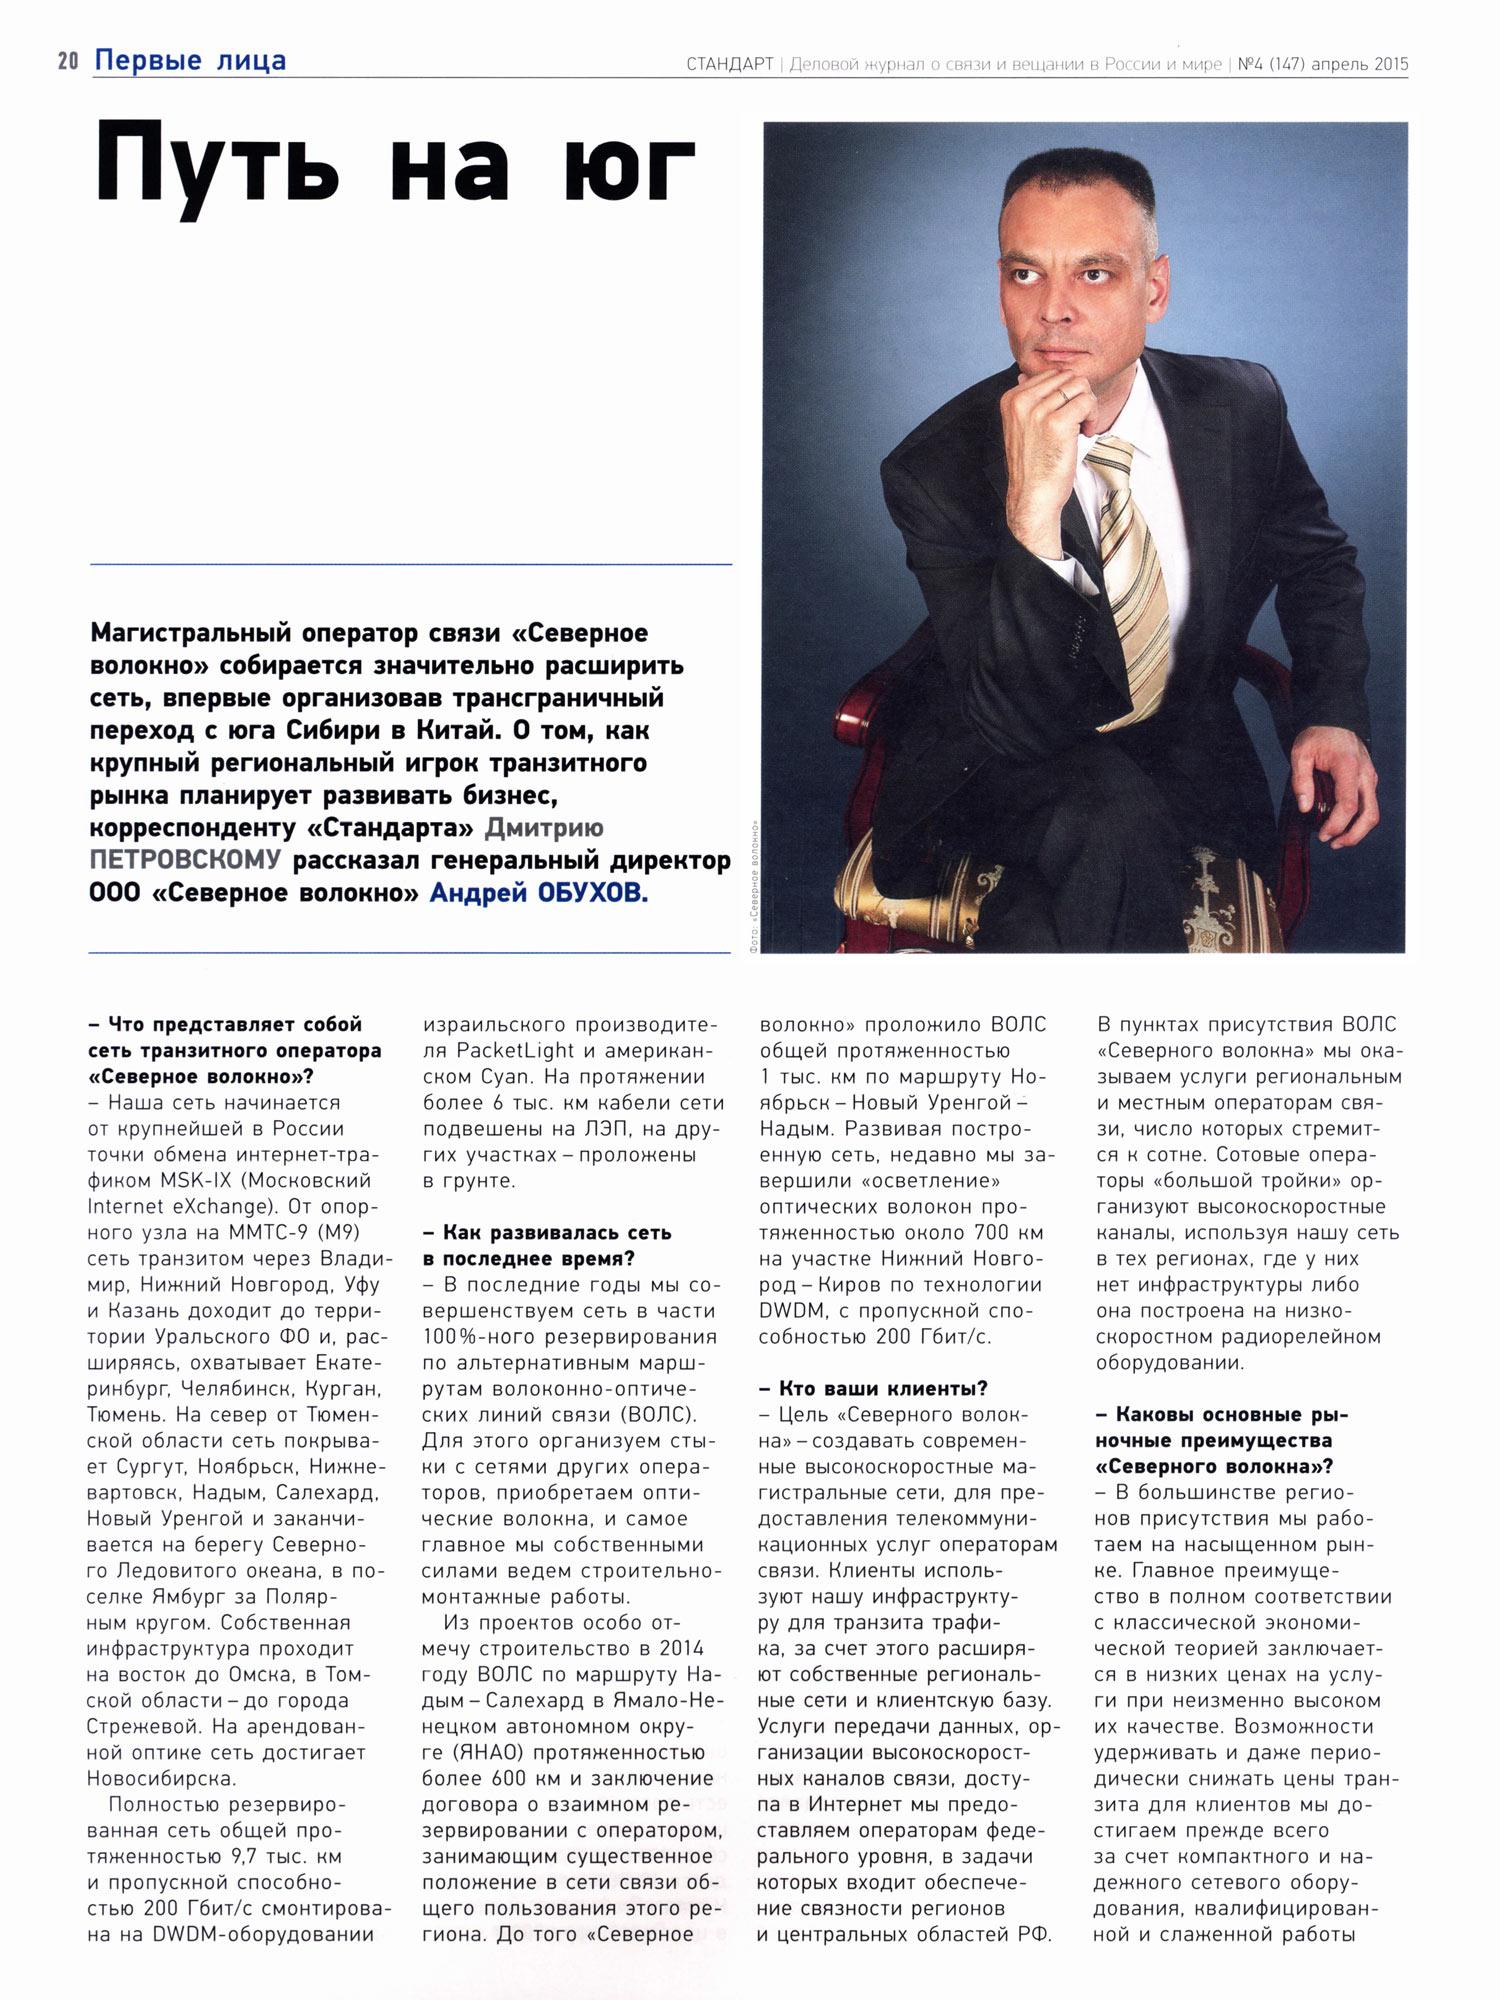 Журнал «Стандарт». Путь на юг, стр. 20 – 21